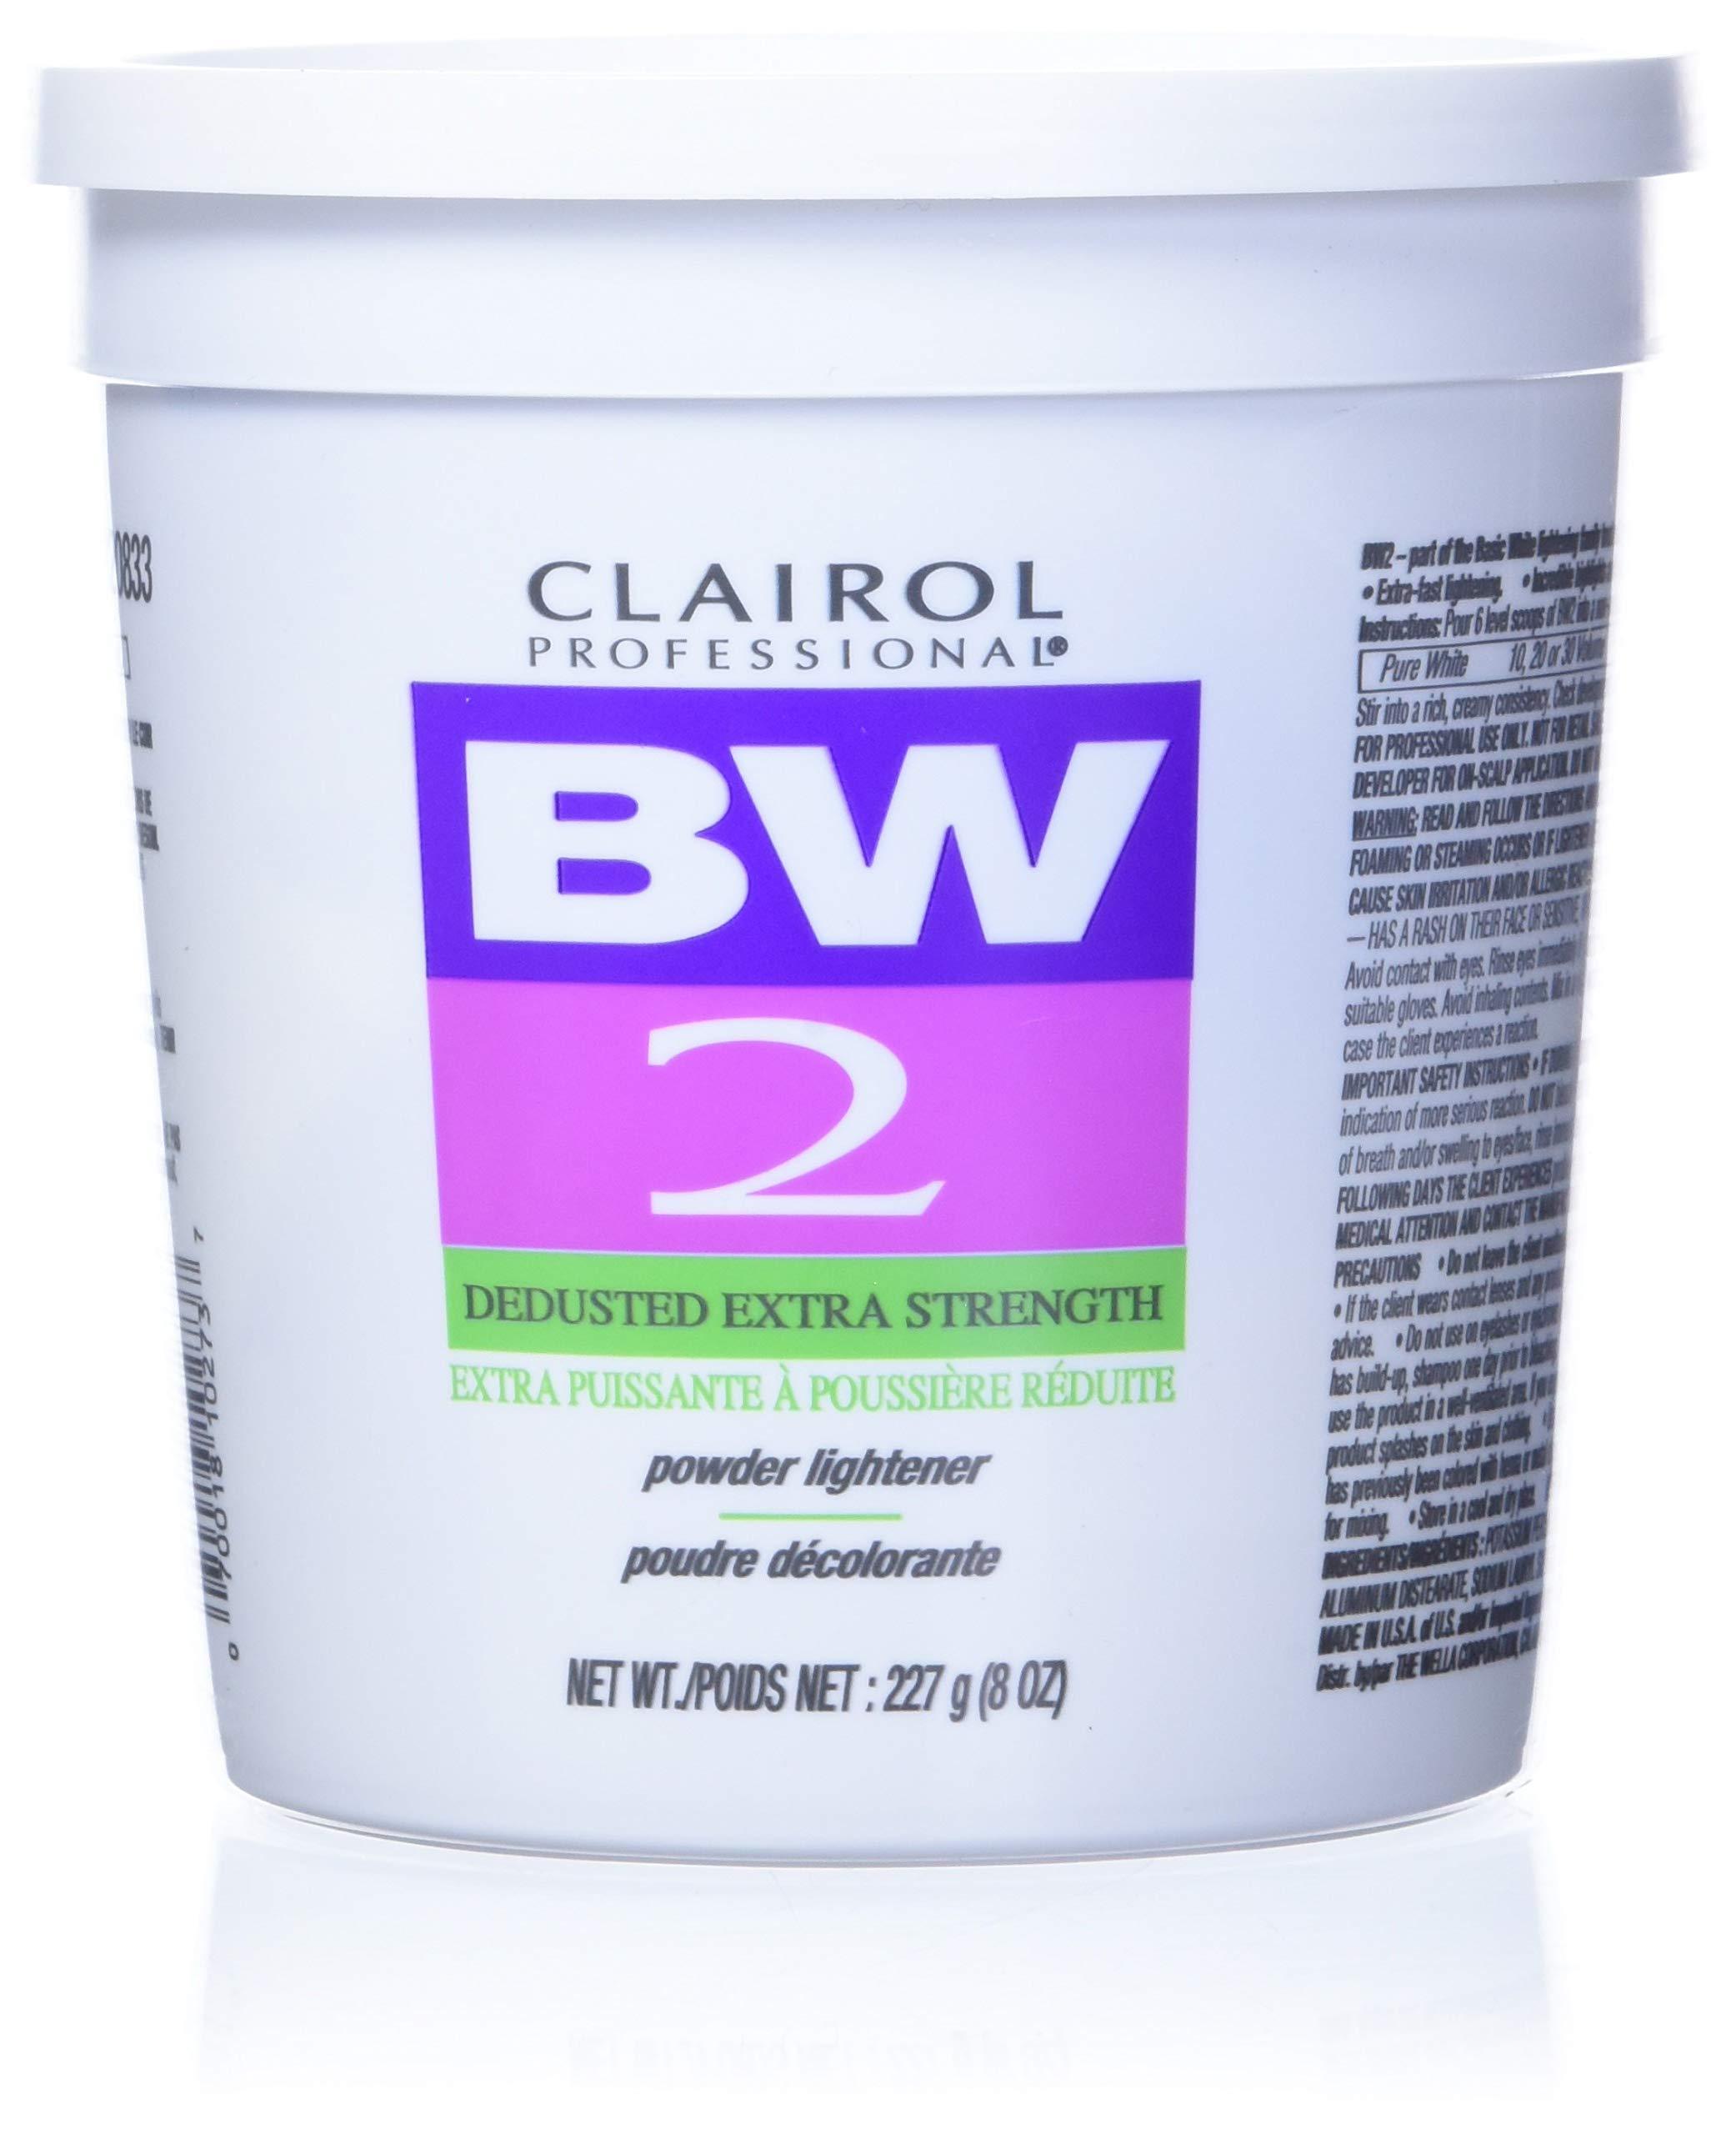 Clairol Professional BW2 Hair Powder Lightener - for Hair Lightening